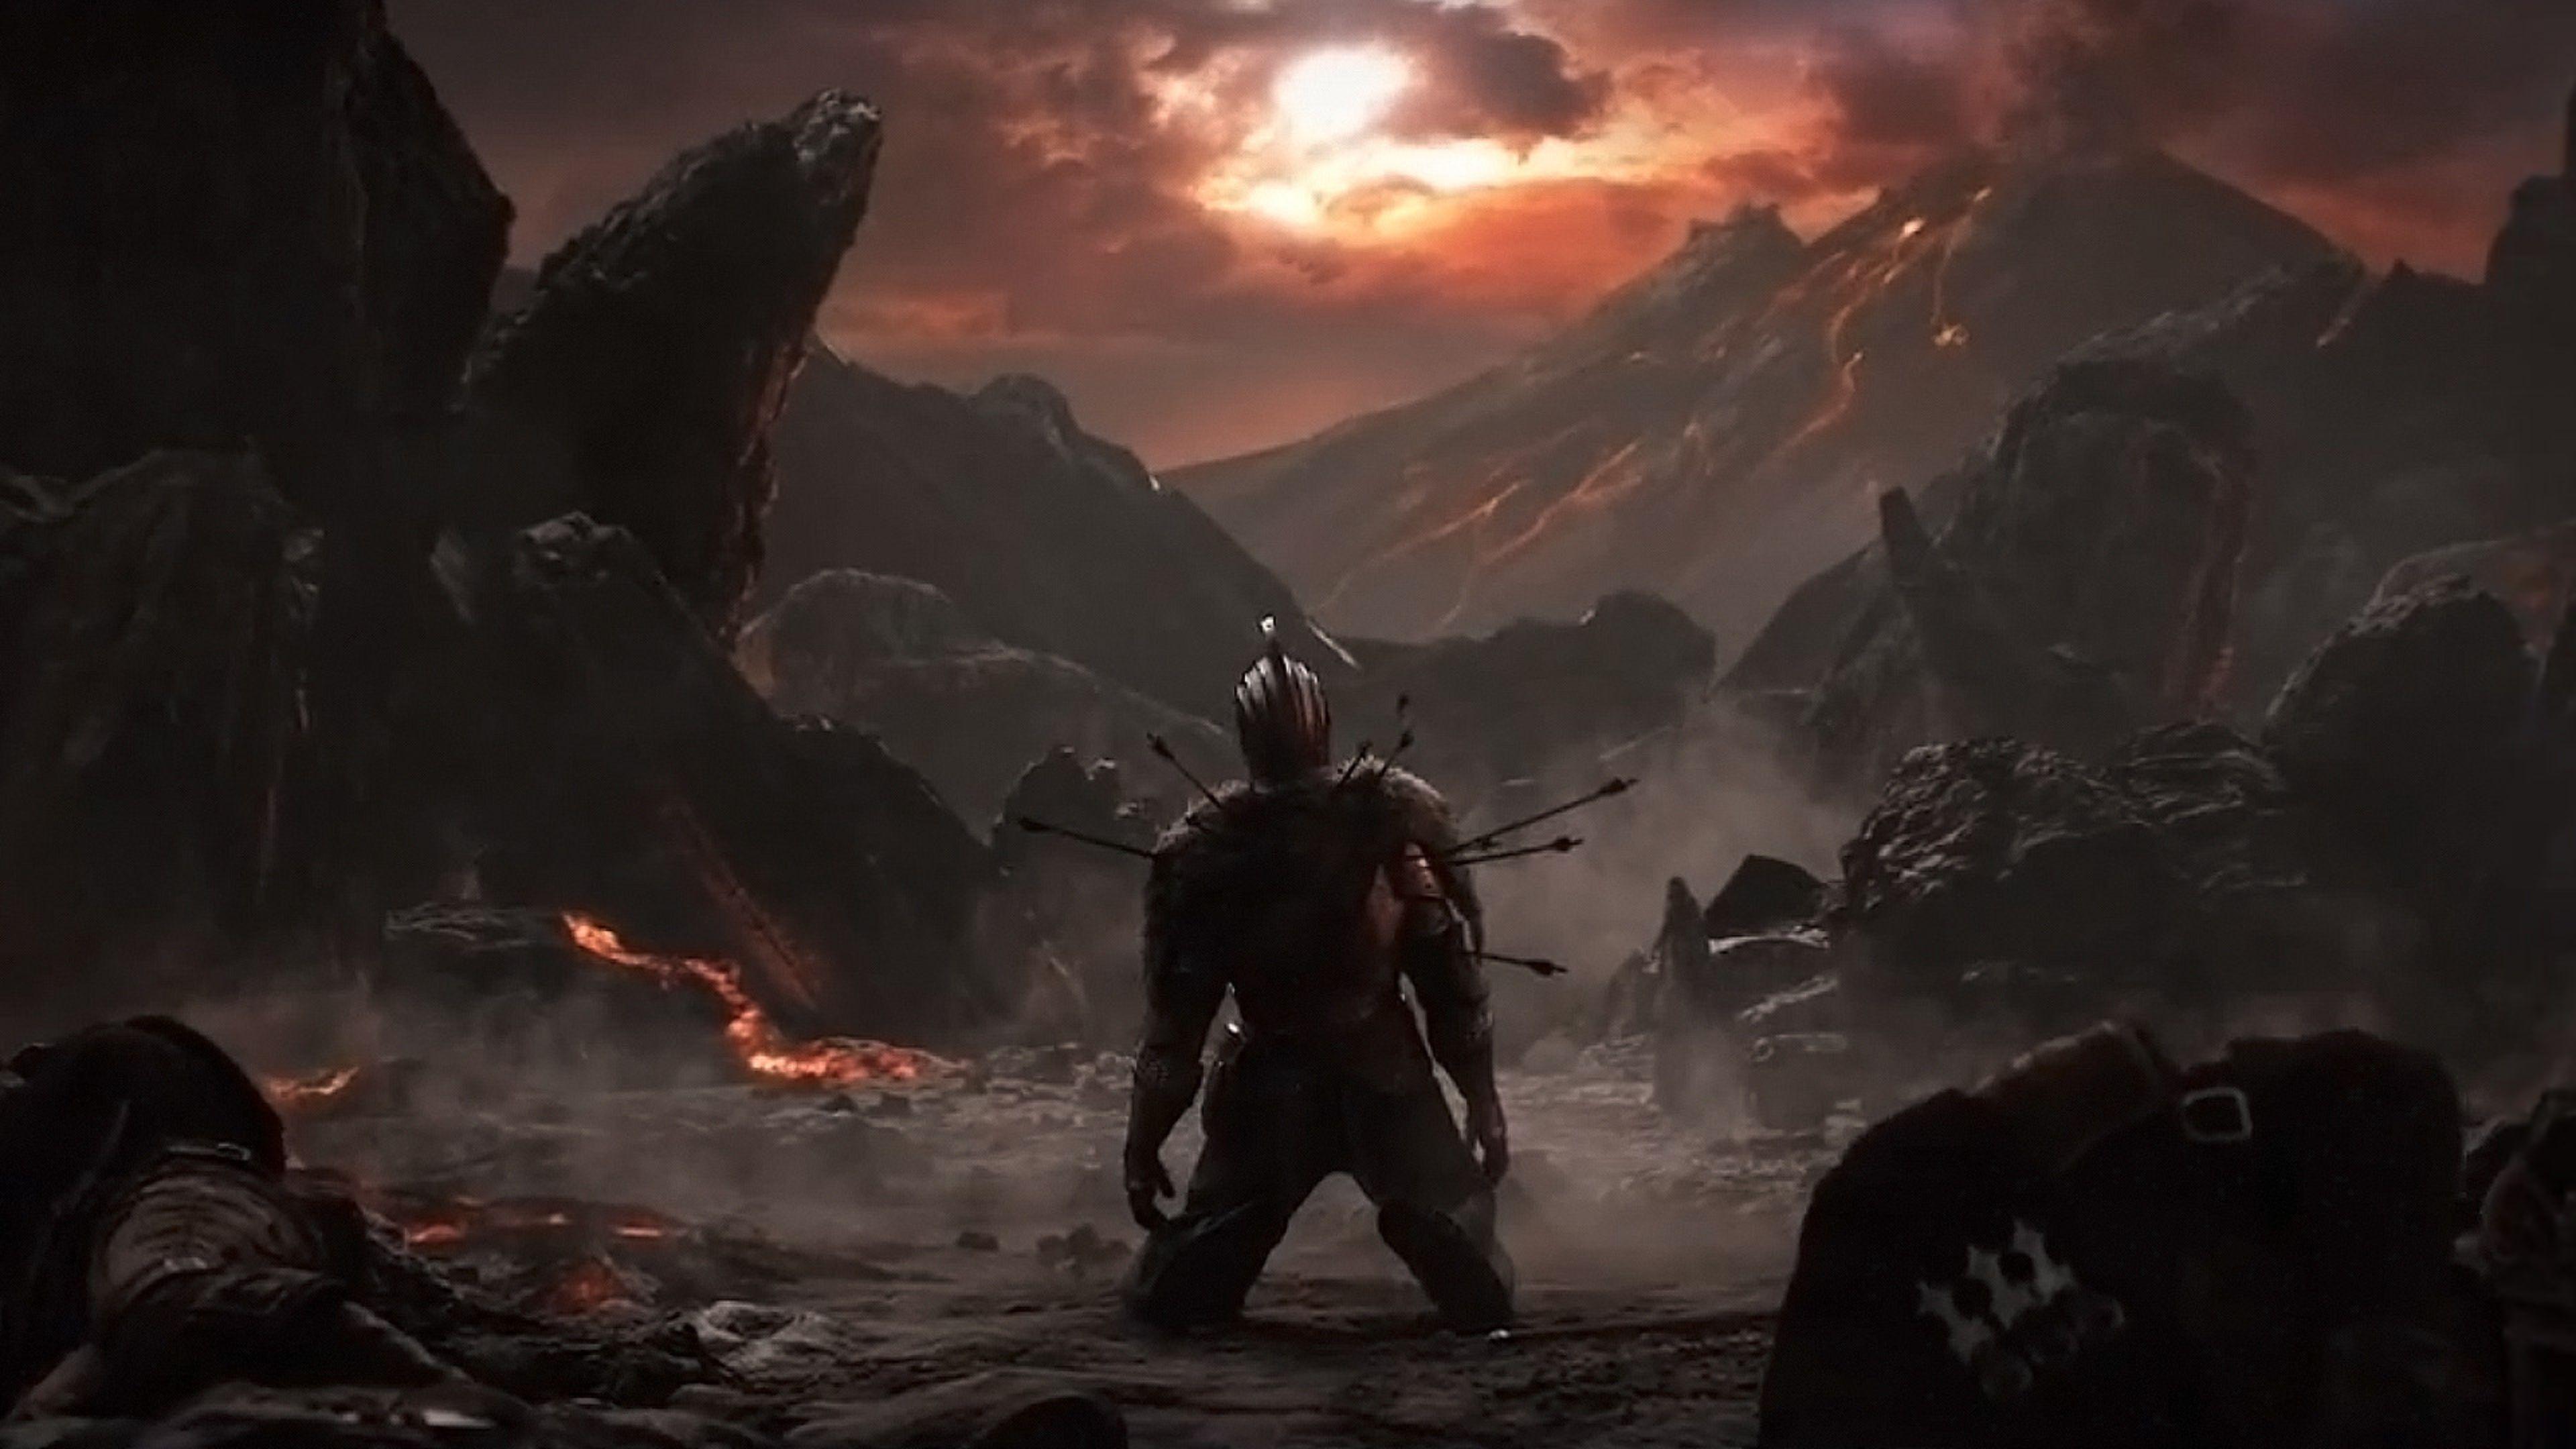 E3 Announcement Dark Souls 3 4K Wallpapers 4K Wallpaper 3840x2160